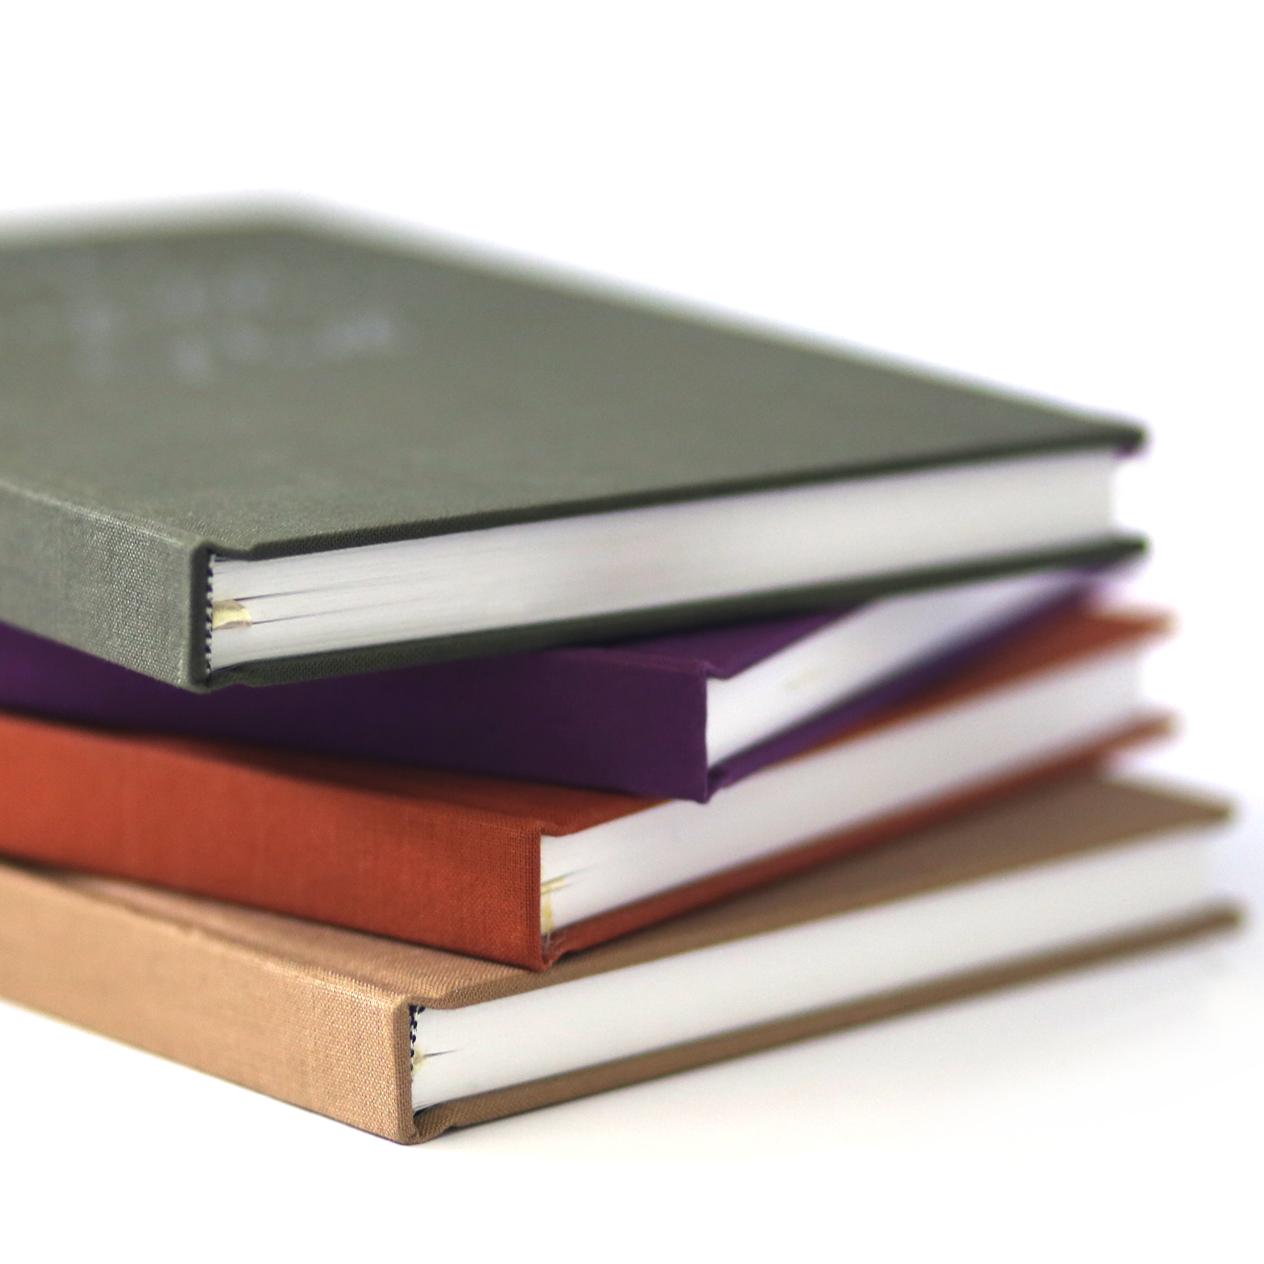 Dedicated Notebook